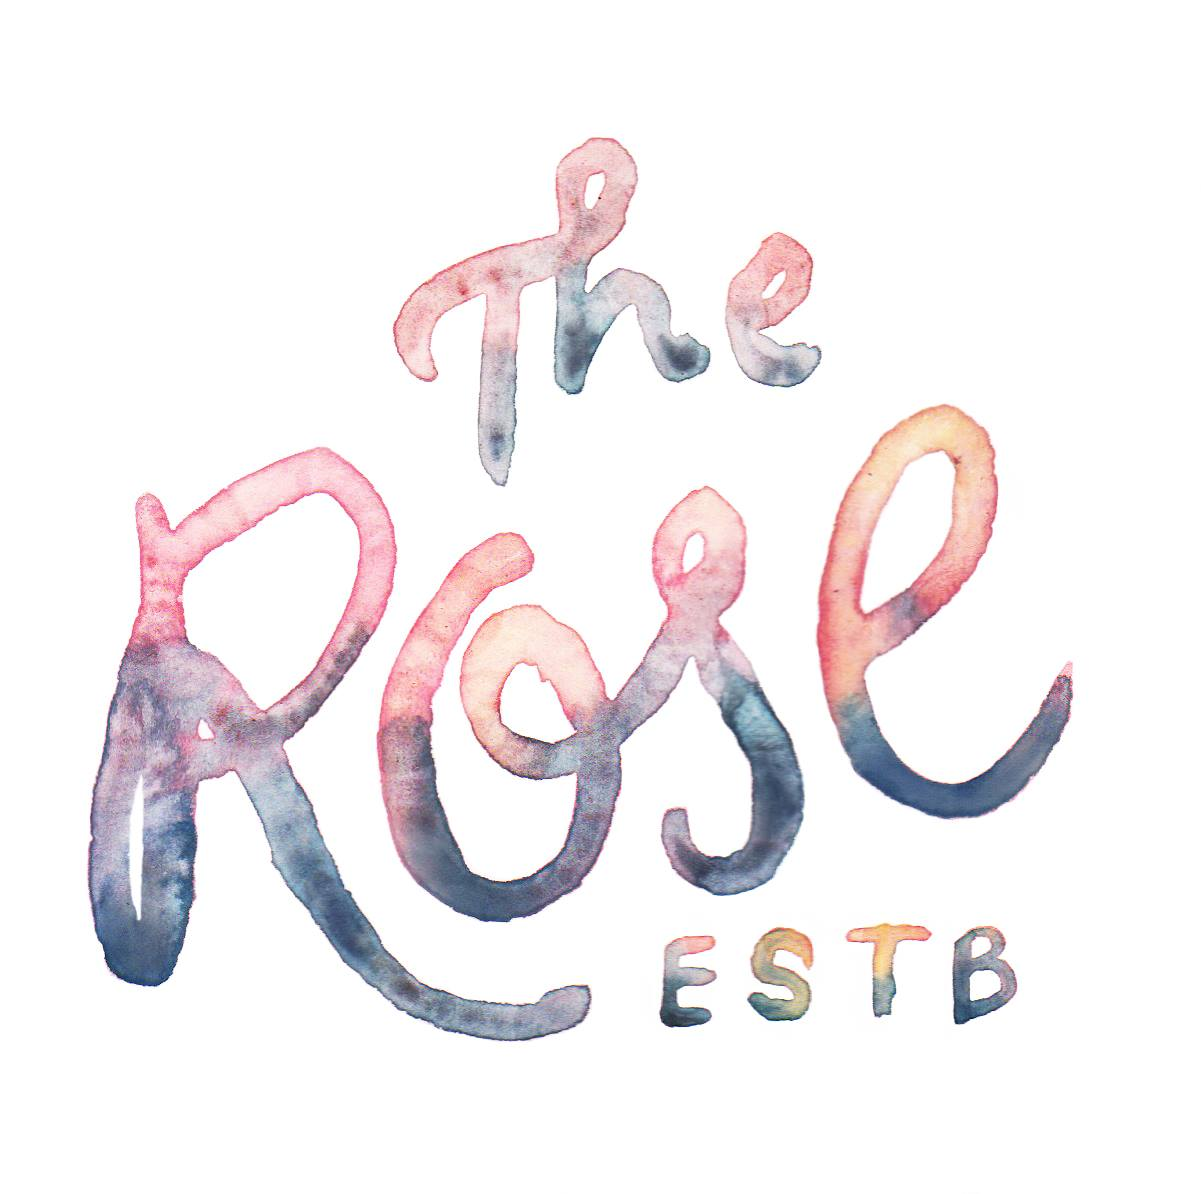 The Rose Establishment